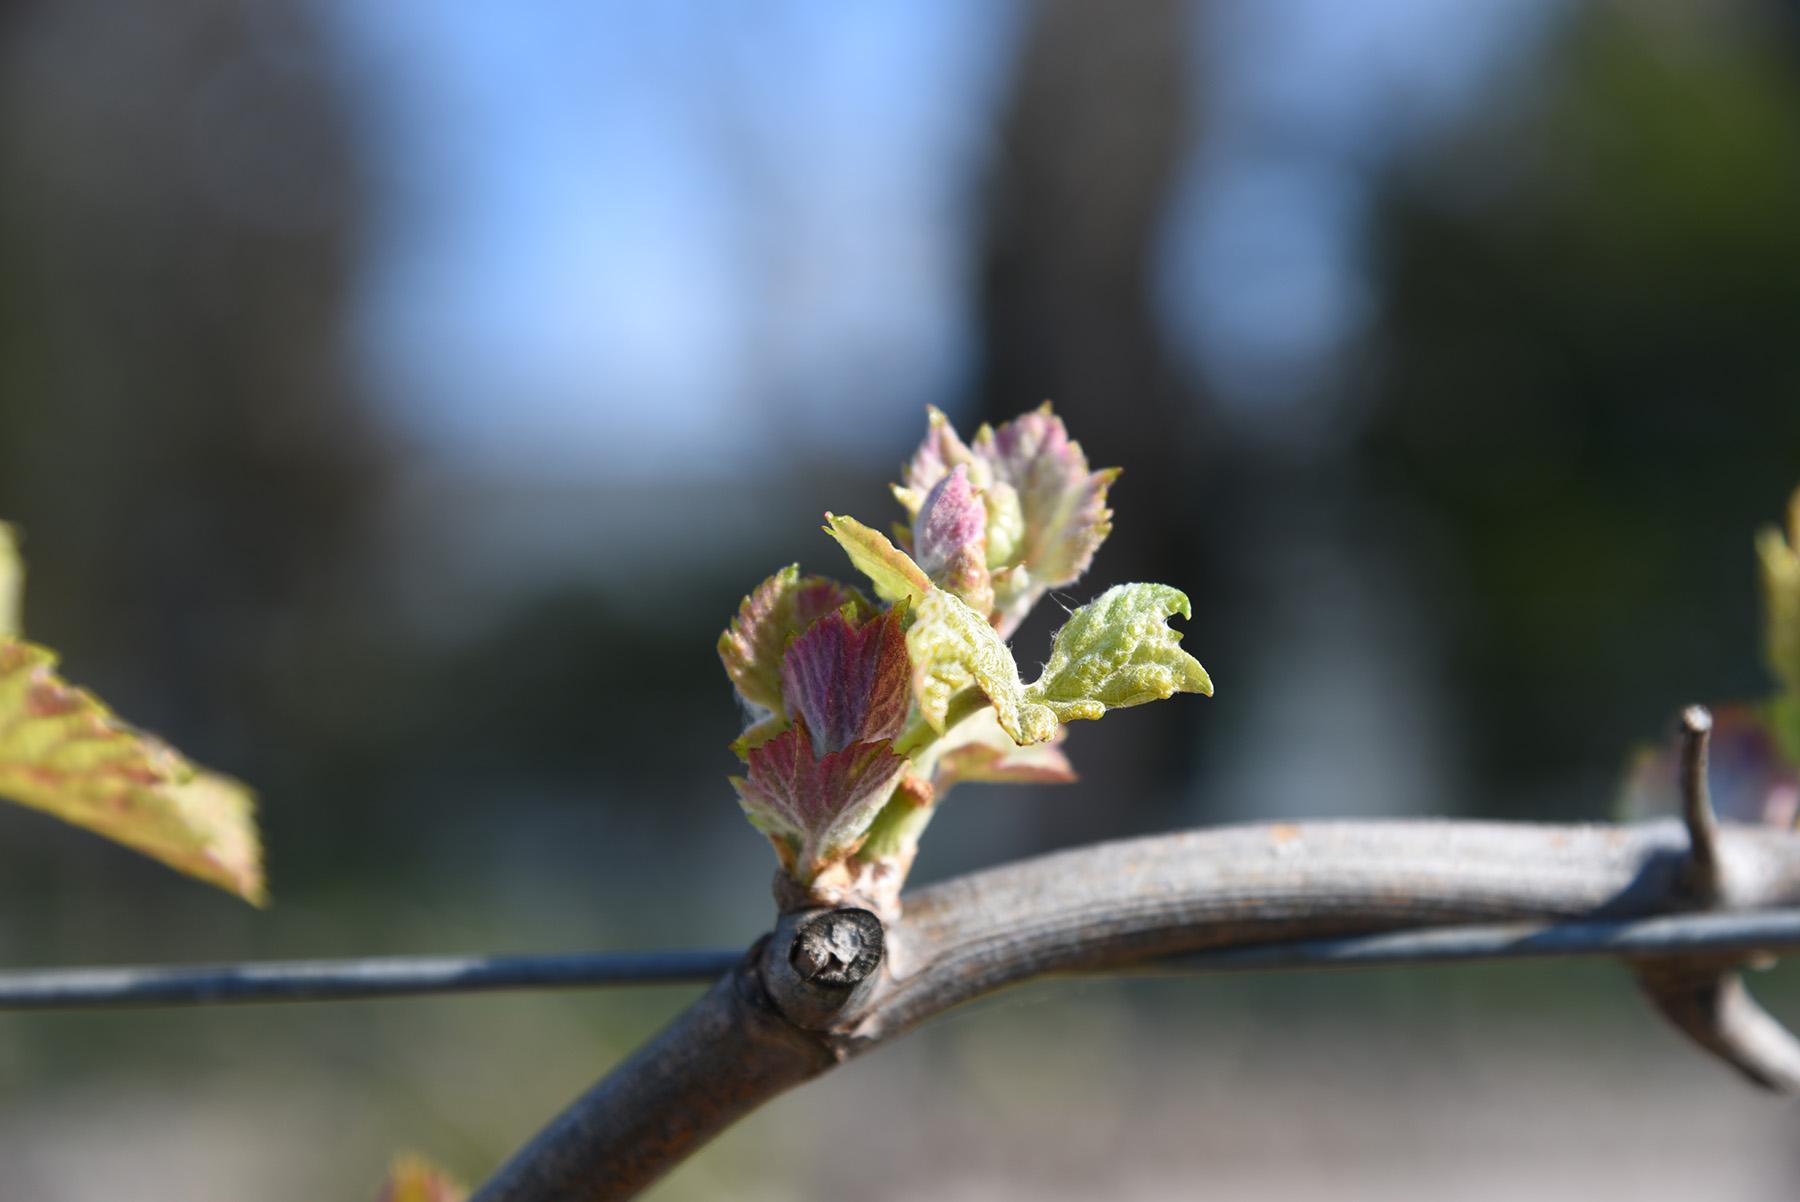 debourrage ou debourrement vigne languedoc